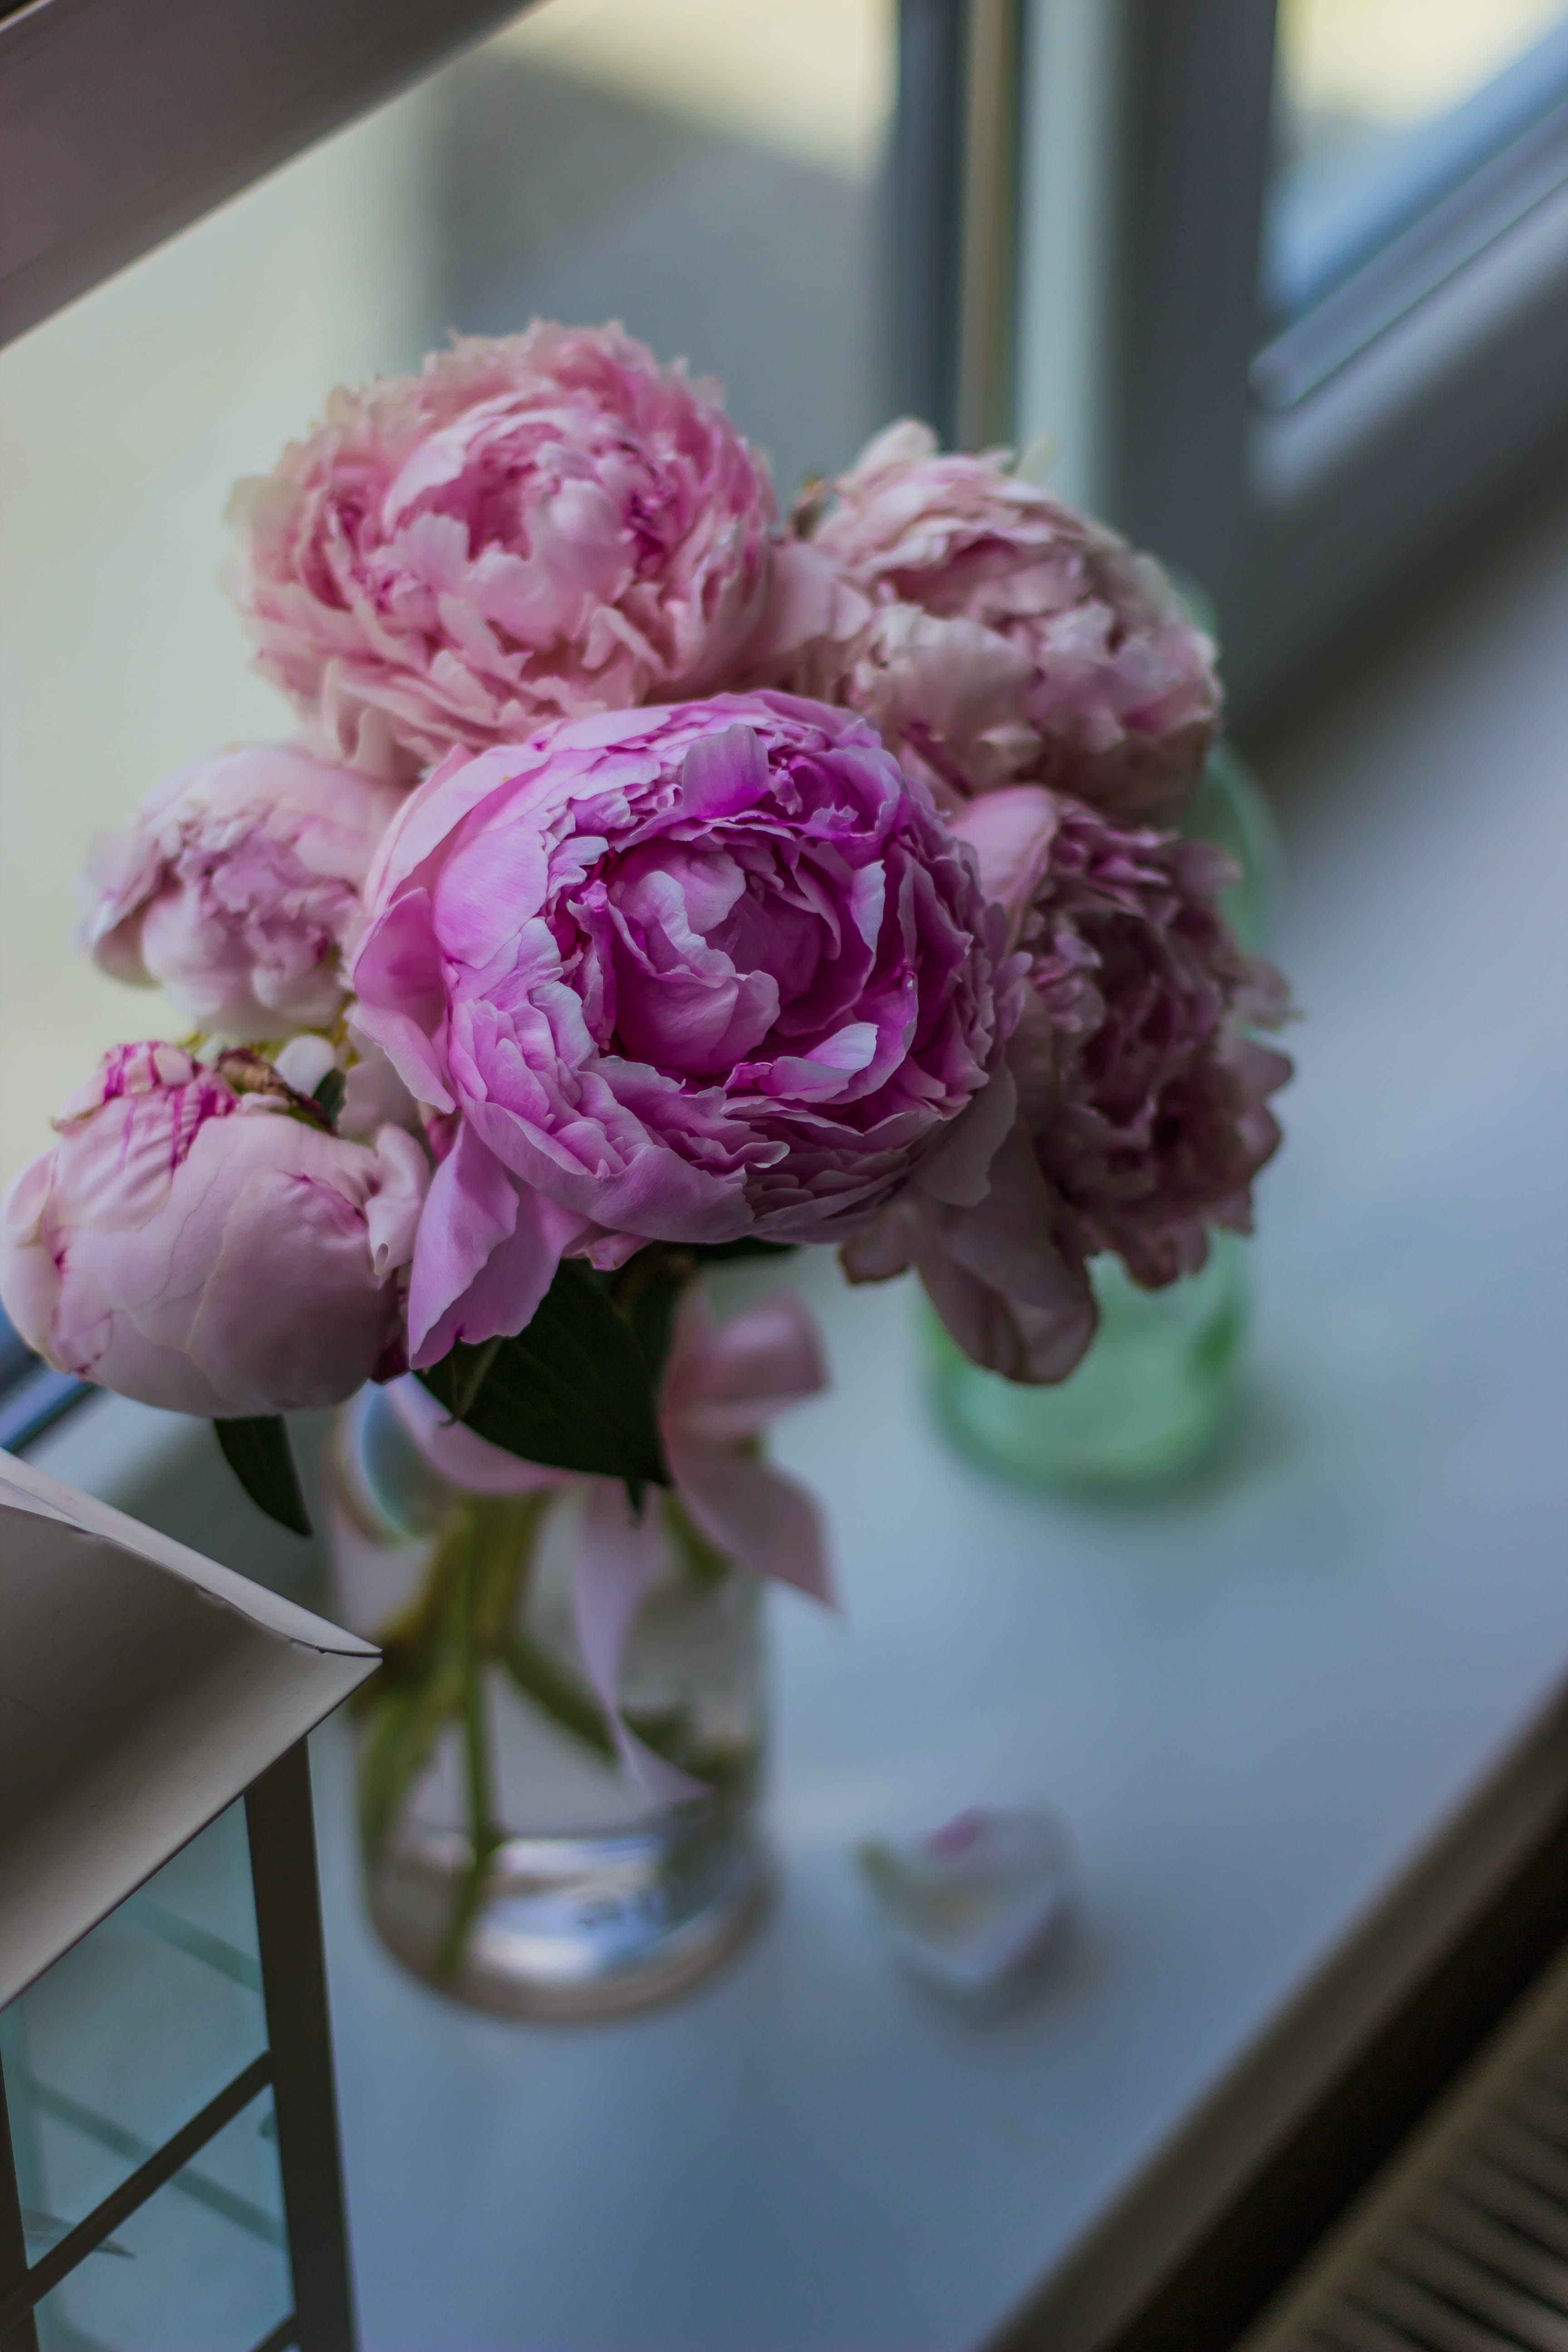 Pink Peony Flowers in Bloom in Clear Glass Vase Beside Glass Window